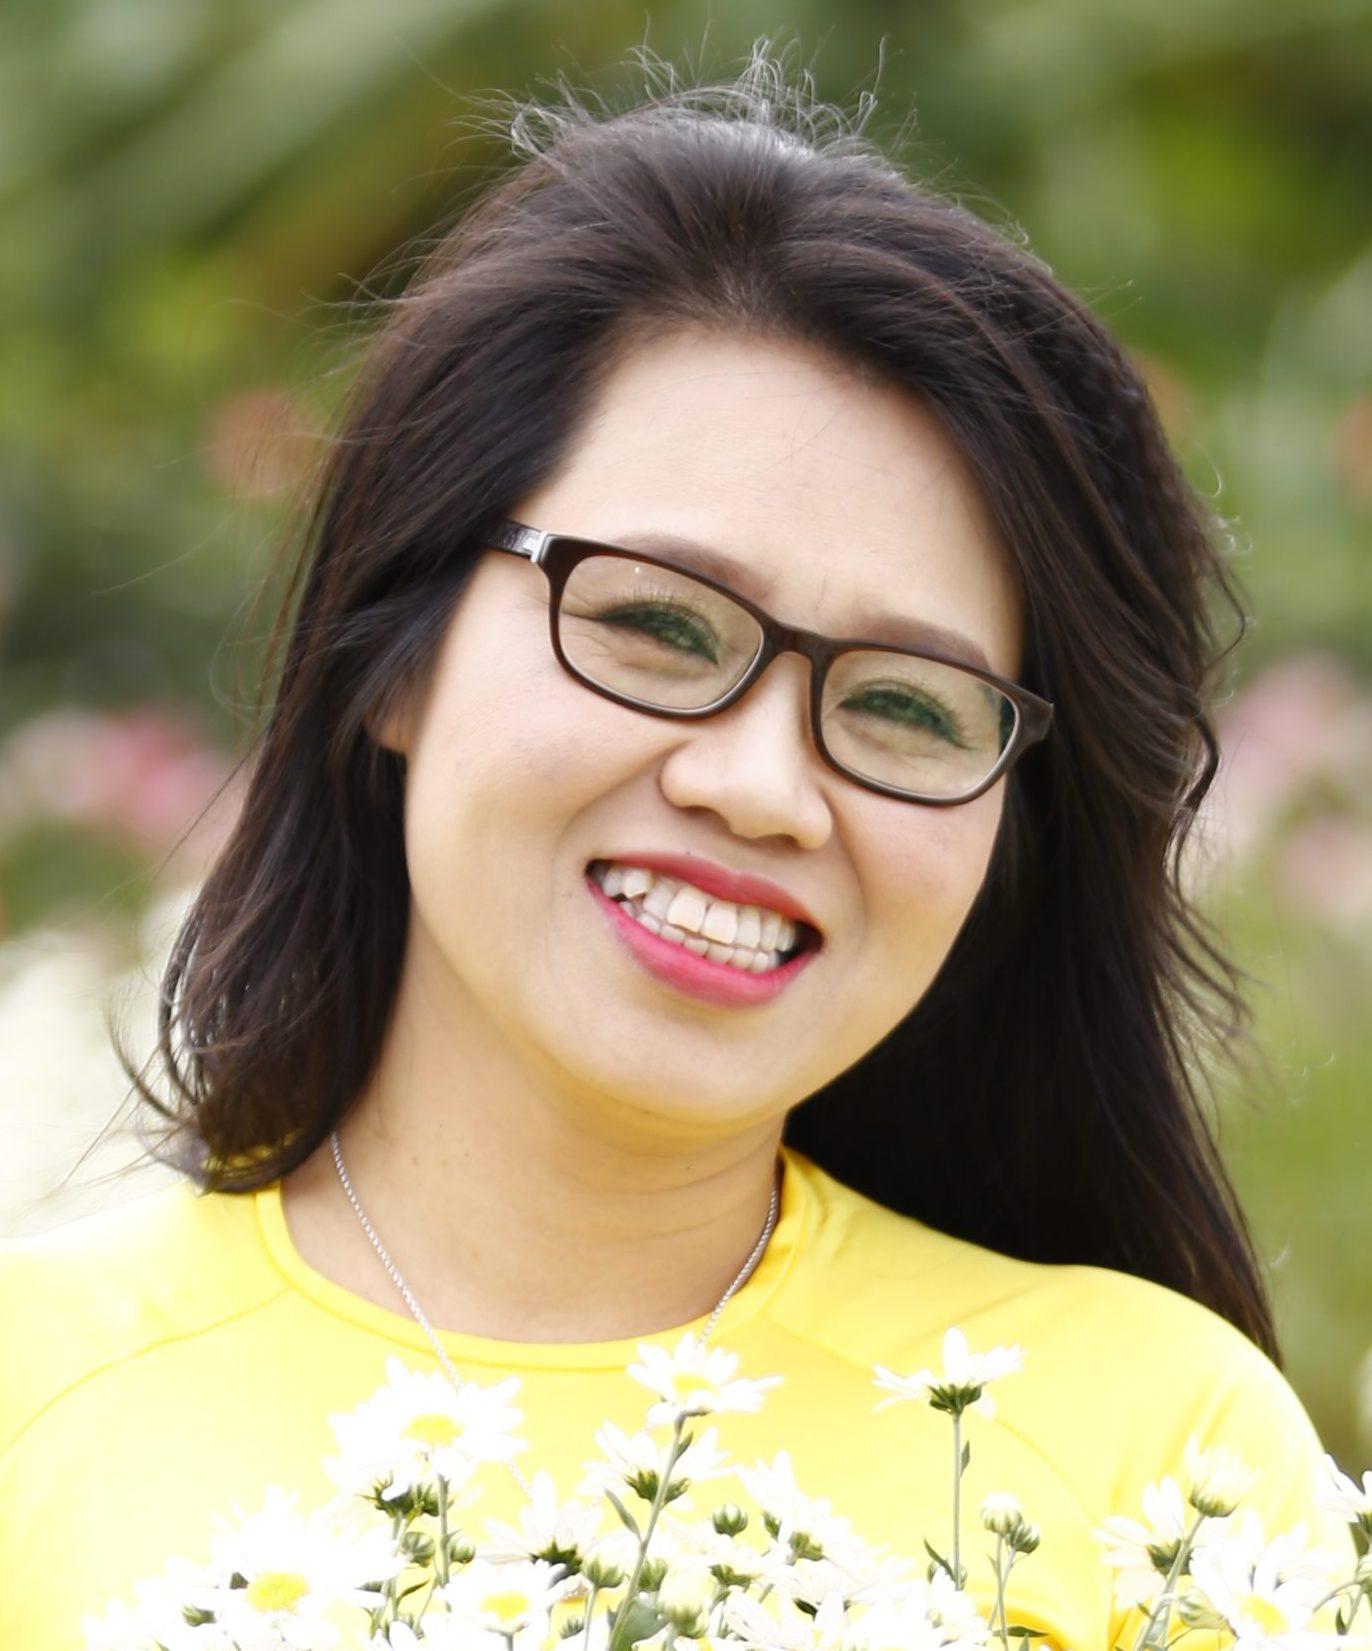 Kim Phuong Dinh